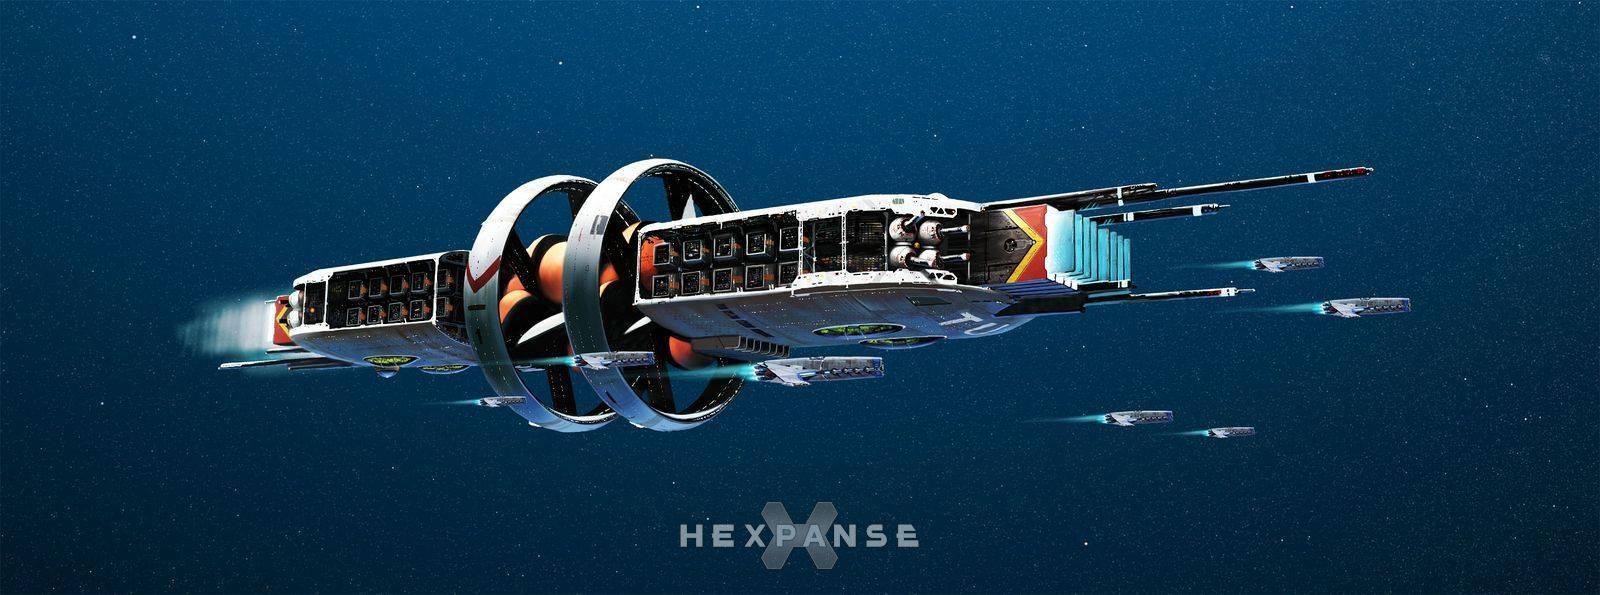 Hexpanse hajó